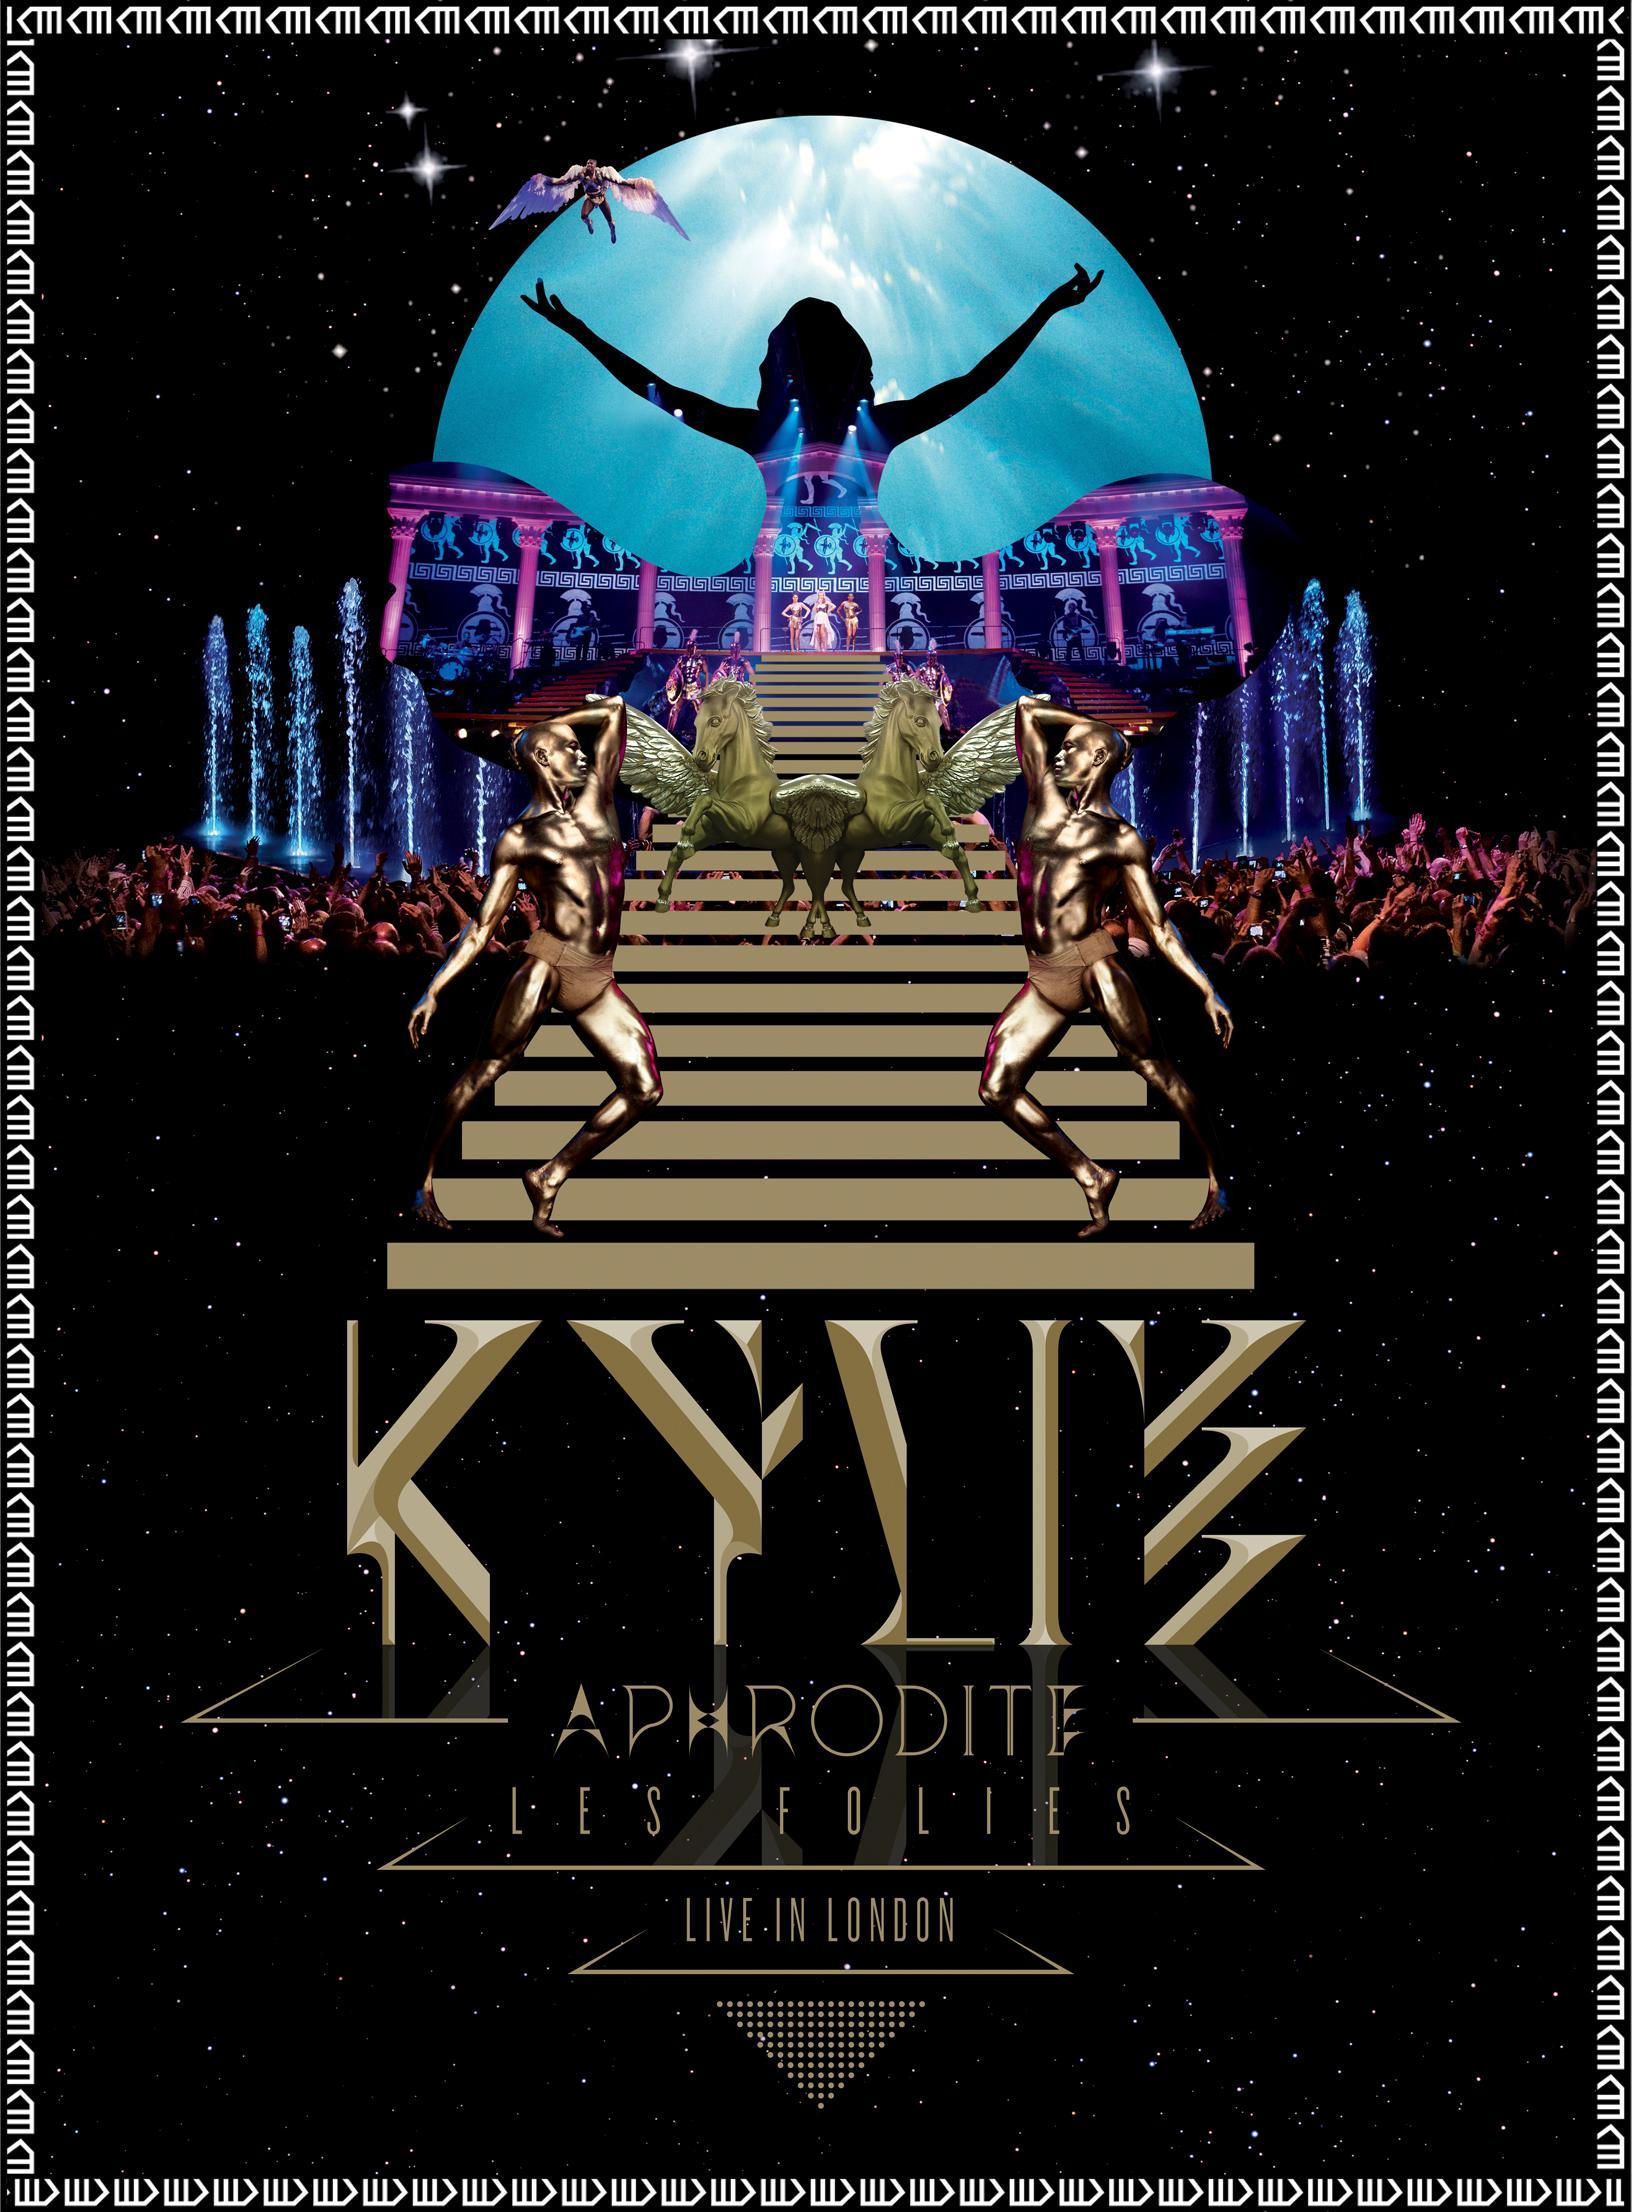 Kylie - Aphrodite: Les Folies Tour 2011 (2011) - IMDb